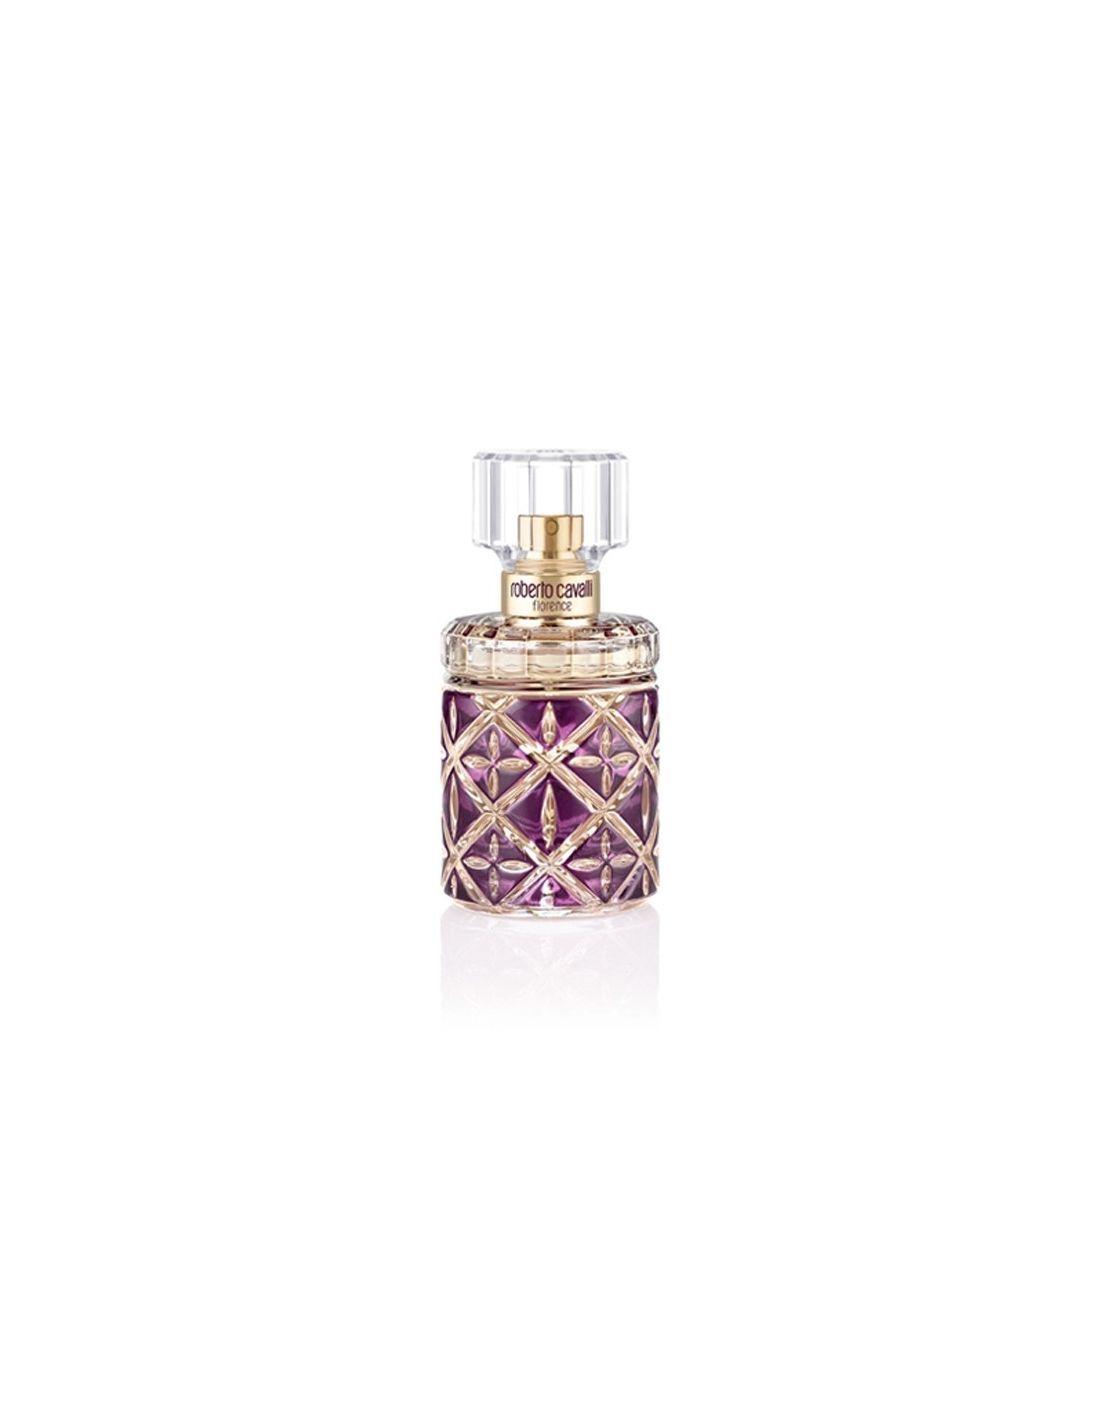 2d8211d2920b8 Roberto Cavalli Florence Eau de Parfum 30 ml Perfumes 24 ...